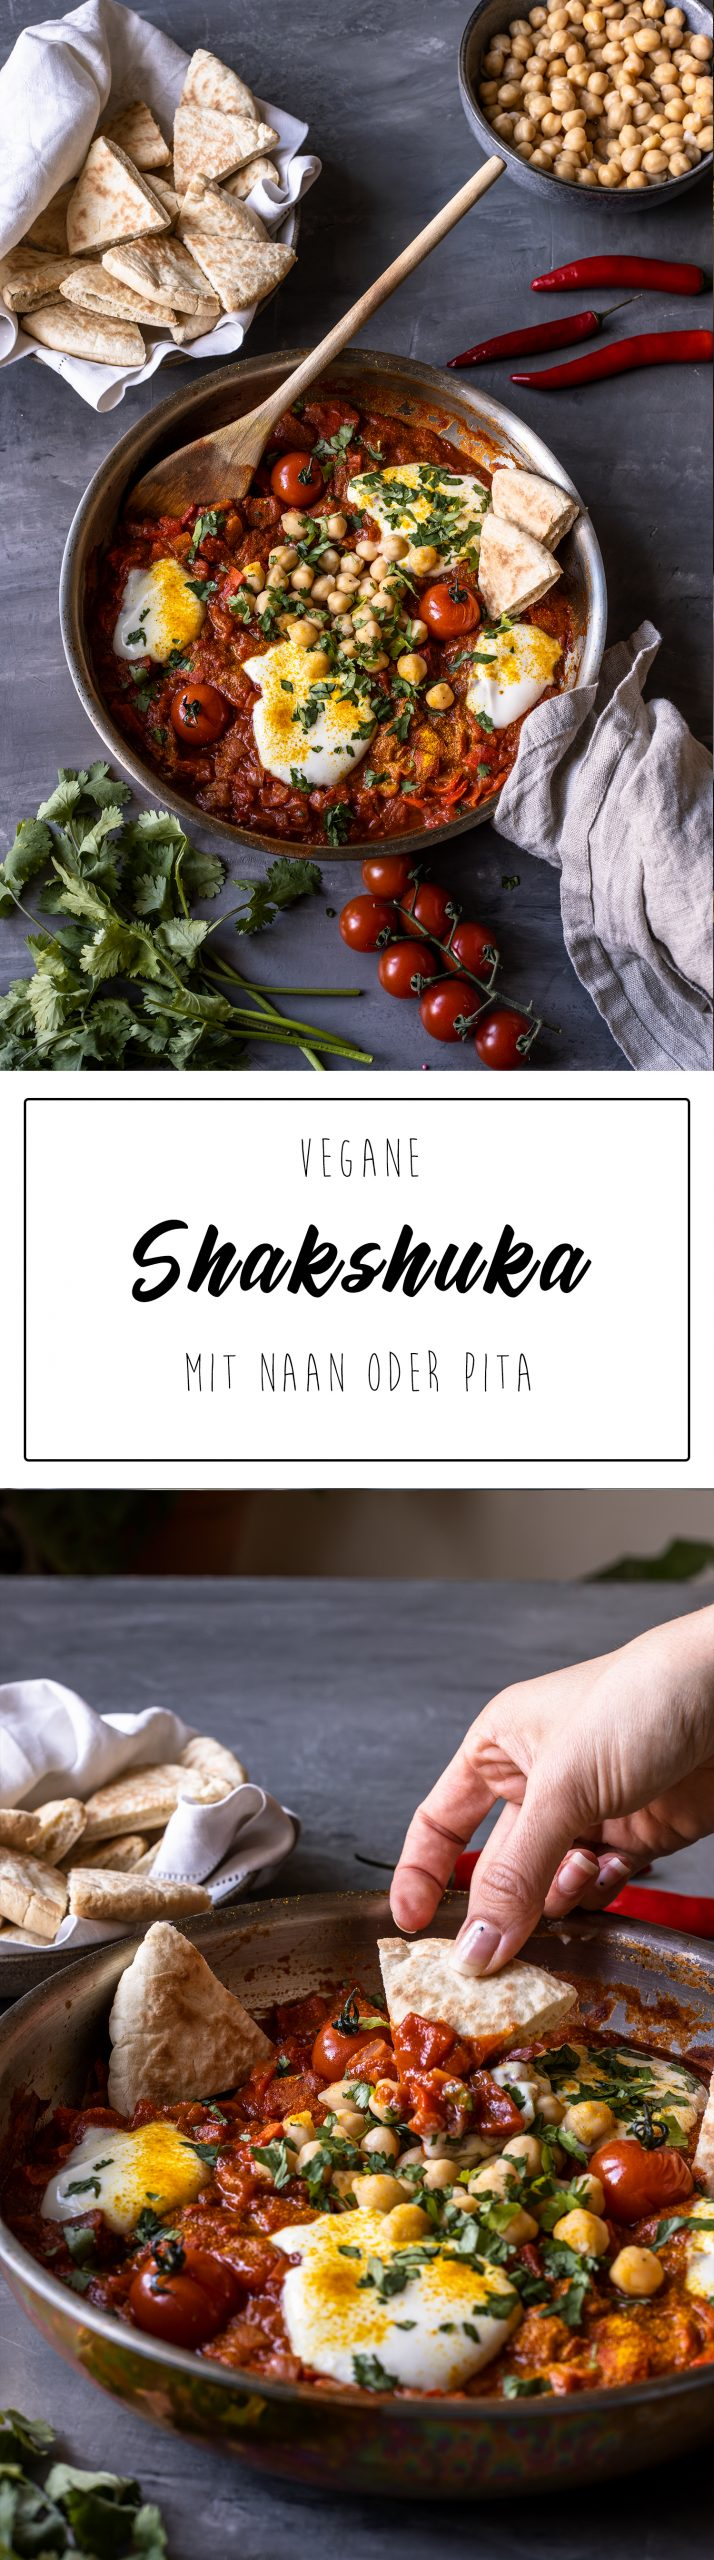 Shakshuka veganPinterest